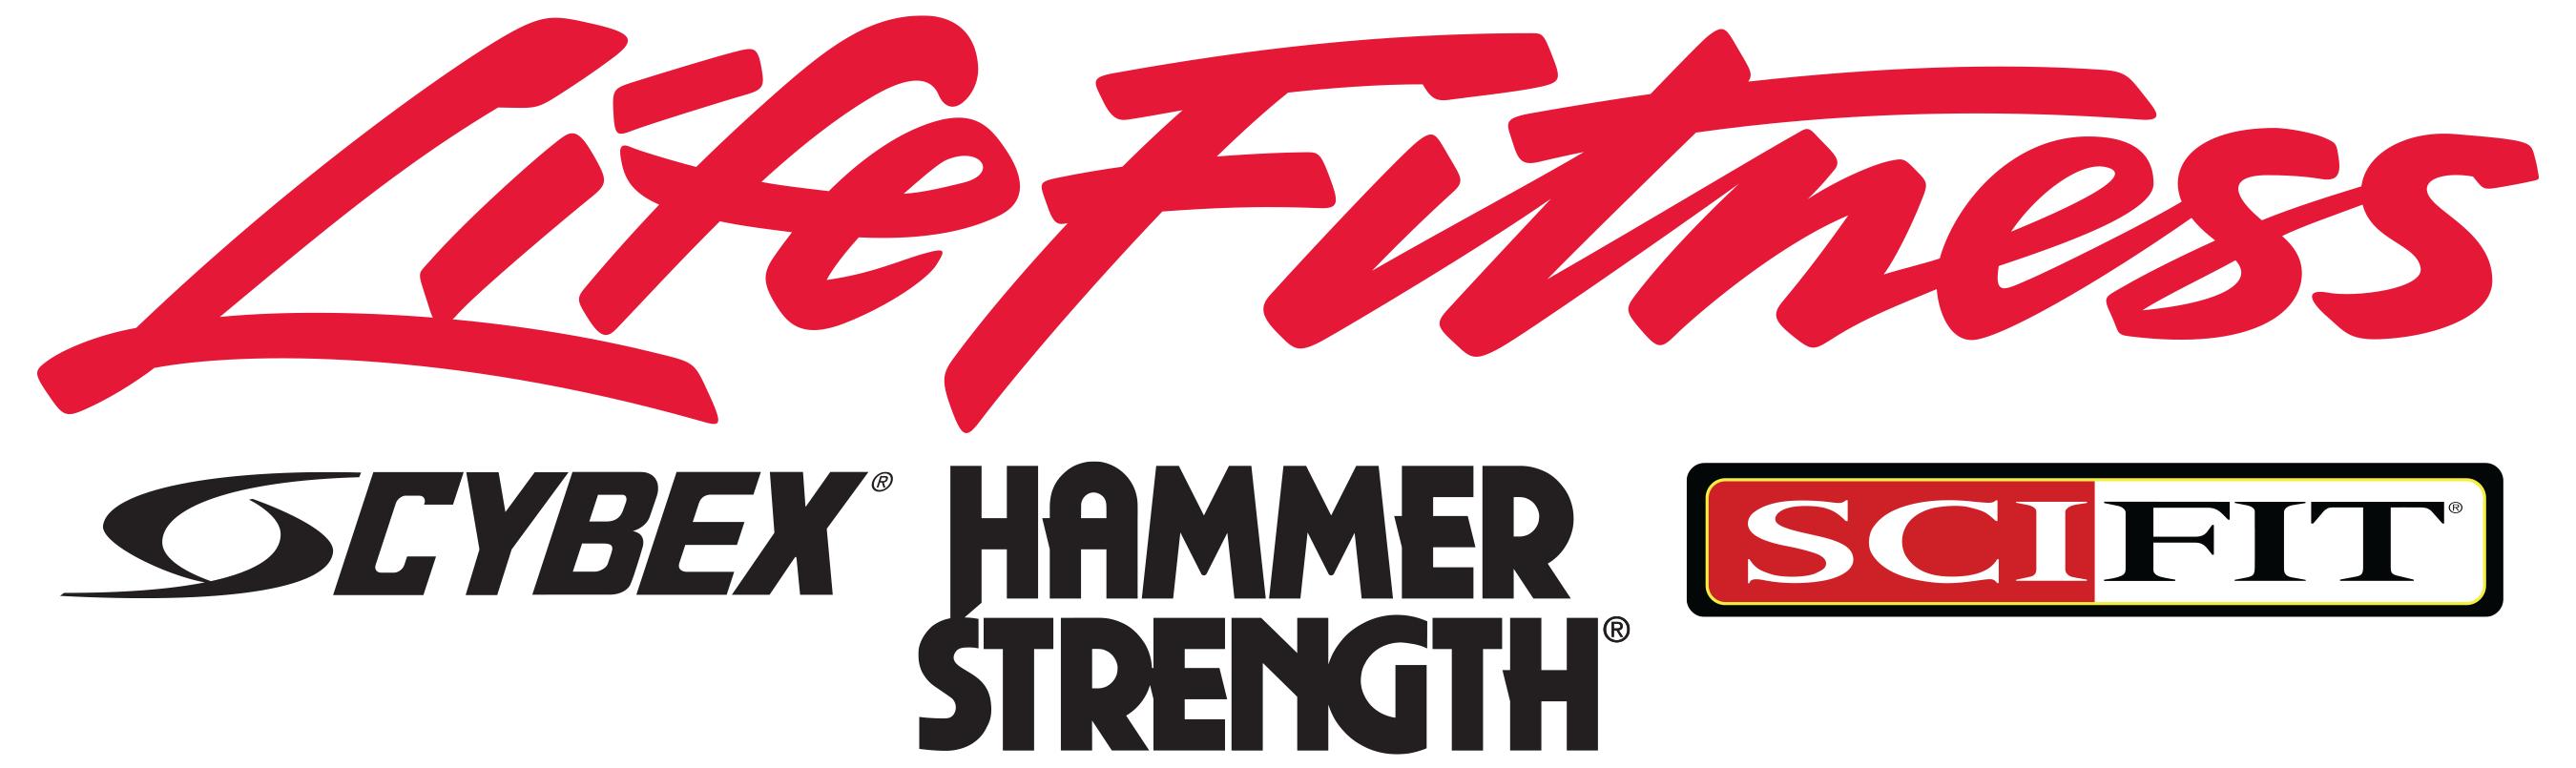 LifeFitness/Hammer Strength/Cybex/SciFit - PFSCCA